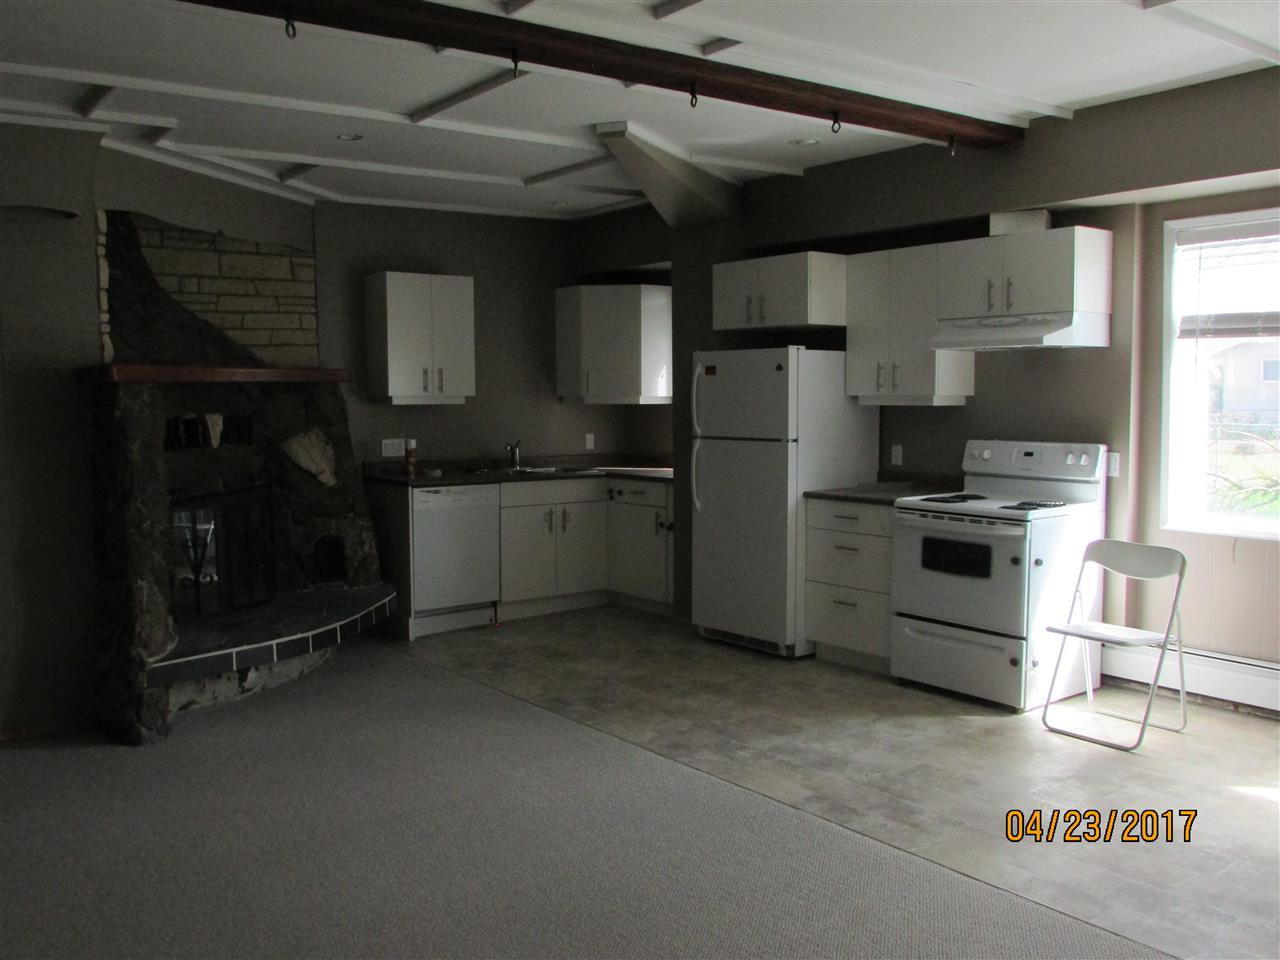 Photo 16: Photos: 7220 EVANS Road in Sardis: Sardis West Vedder Rd House for sale : MLS®# R2160379